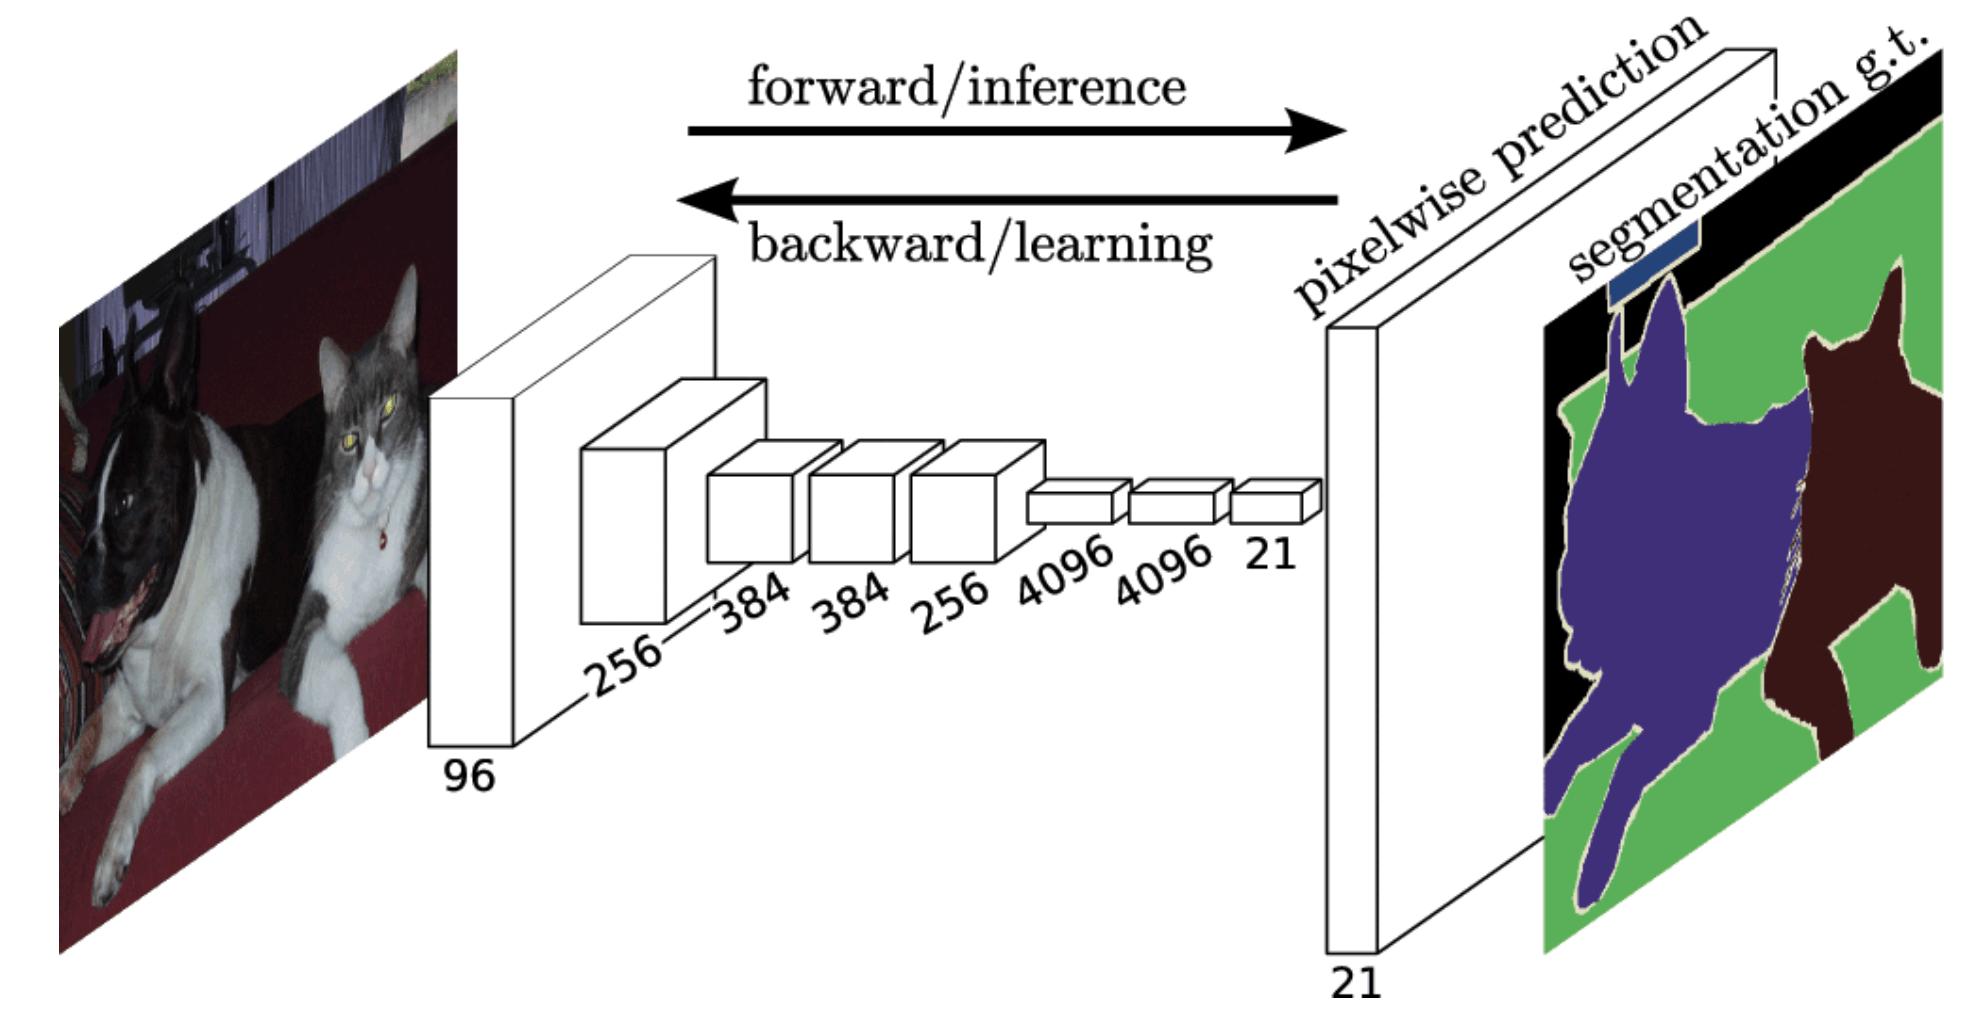 Satellite images semantic segmentation with deep learning 1